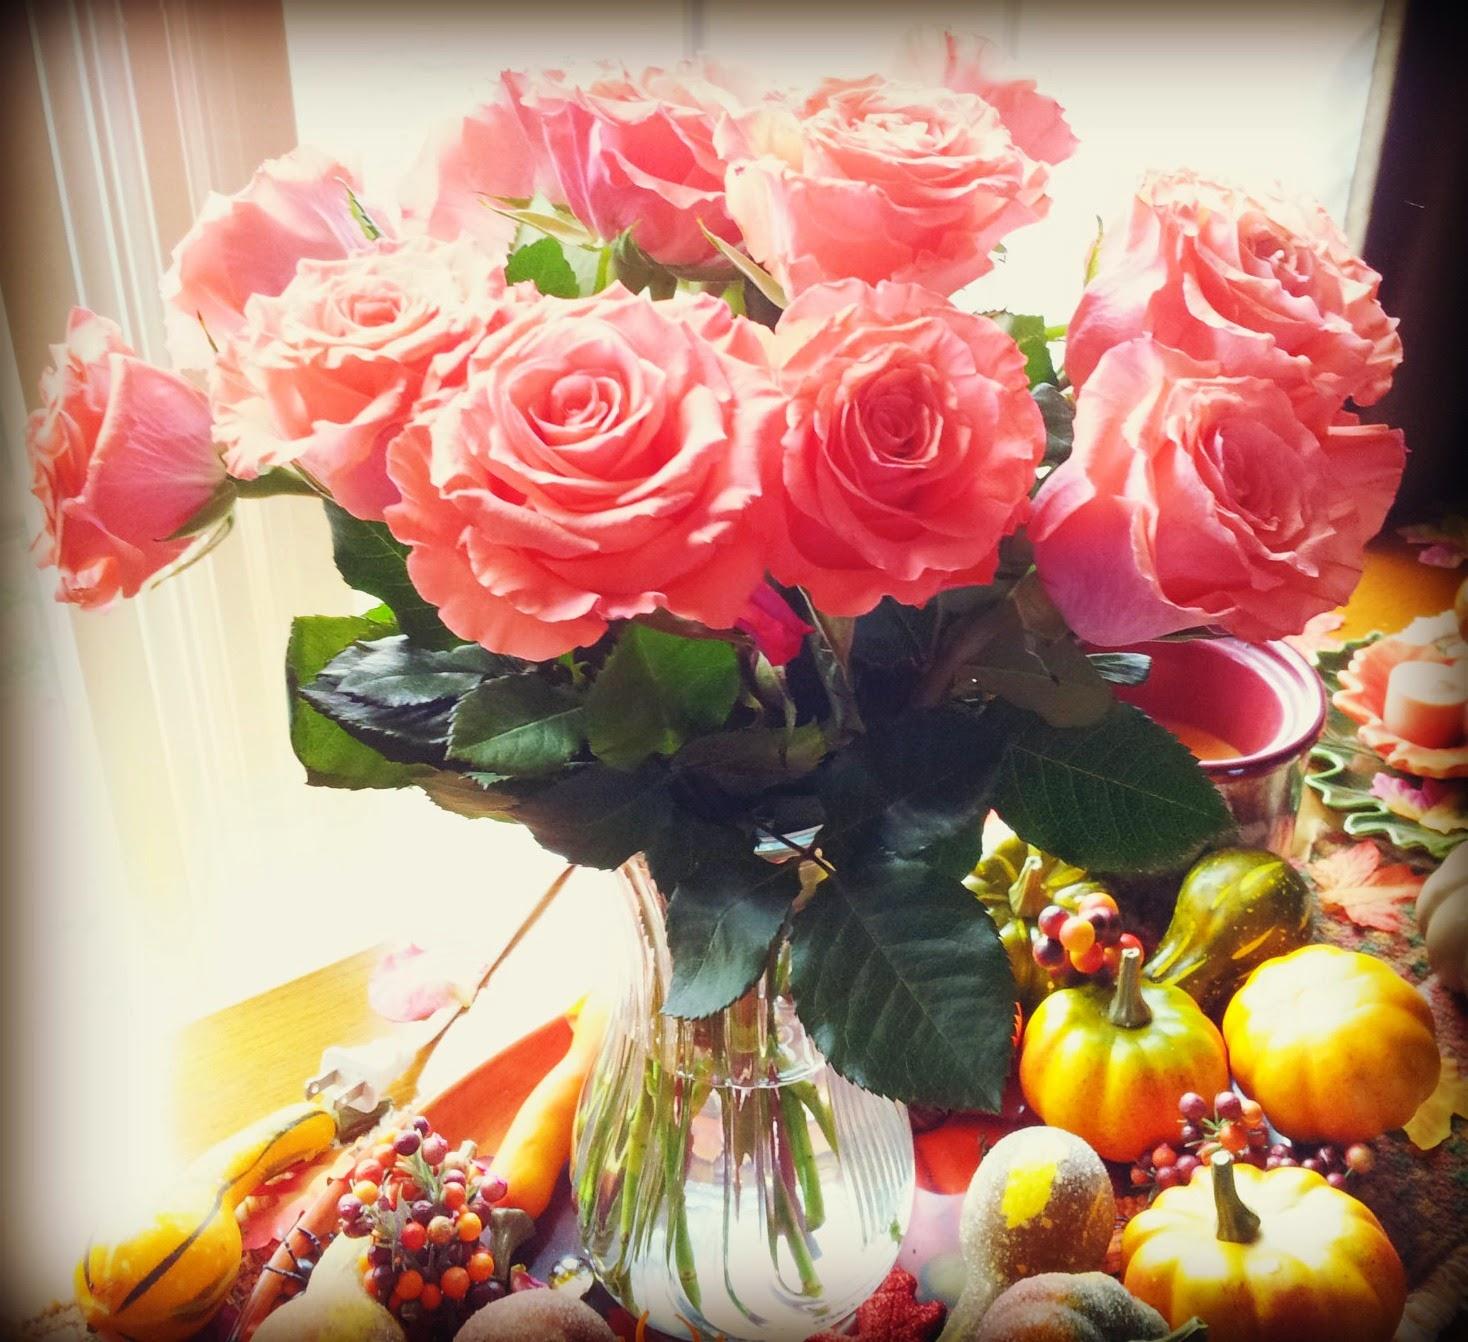 Clapper chronicles october 2014 my birthday flowers october 17th izmirmasajfo